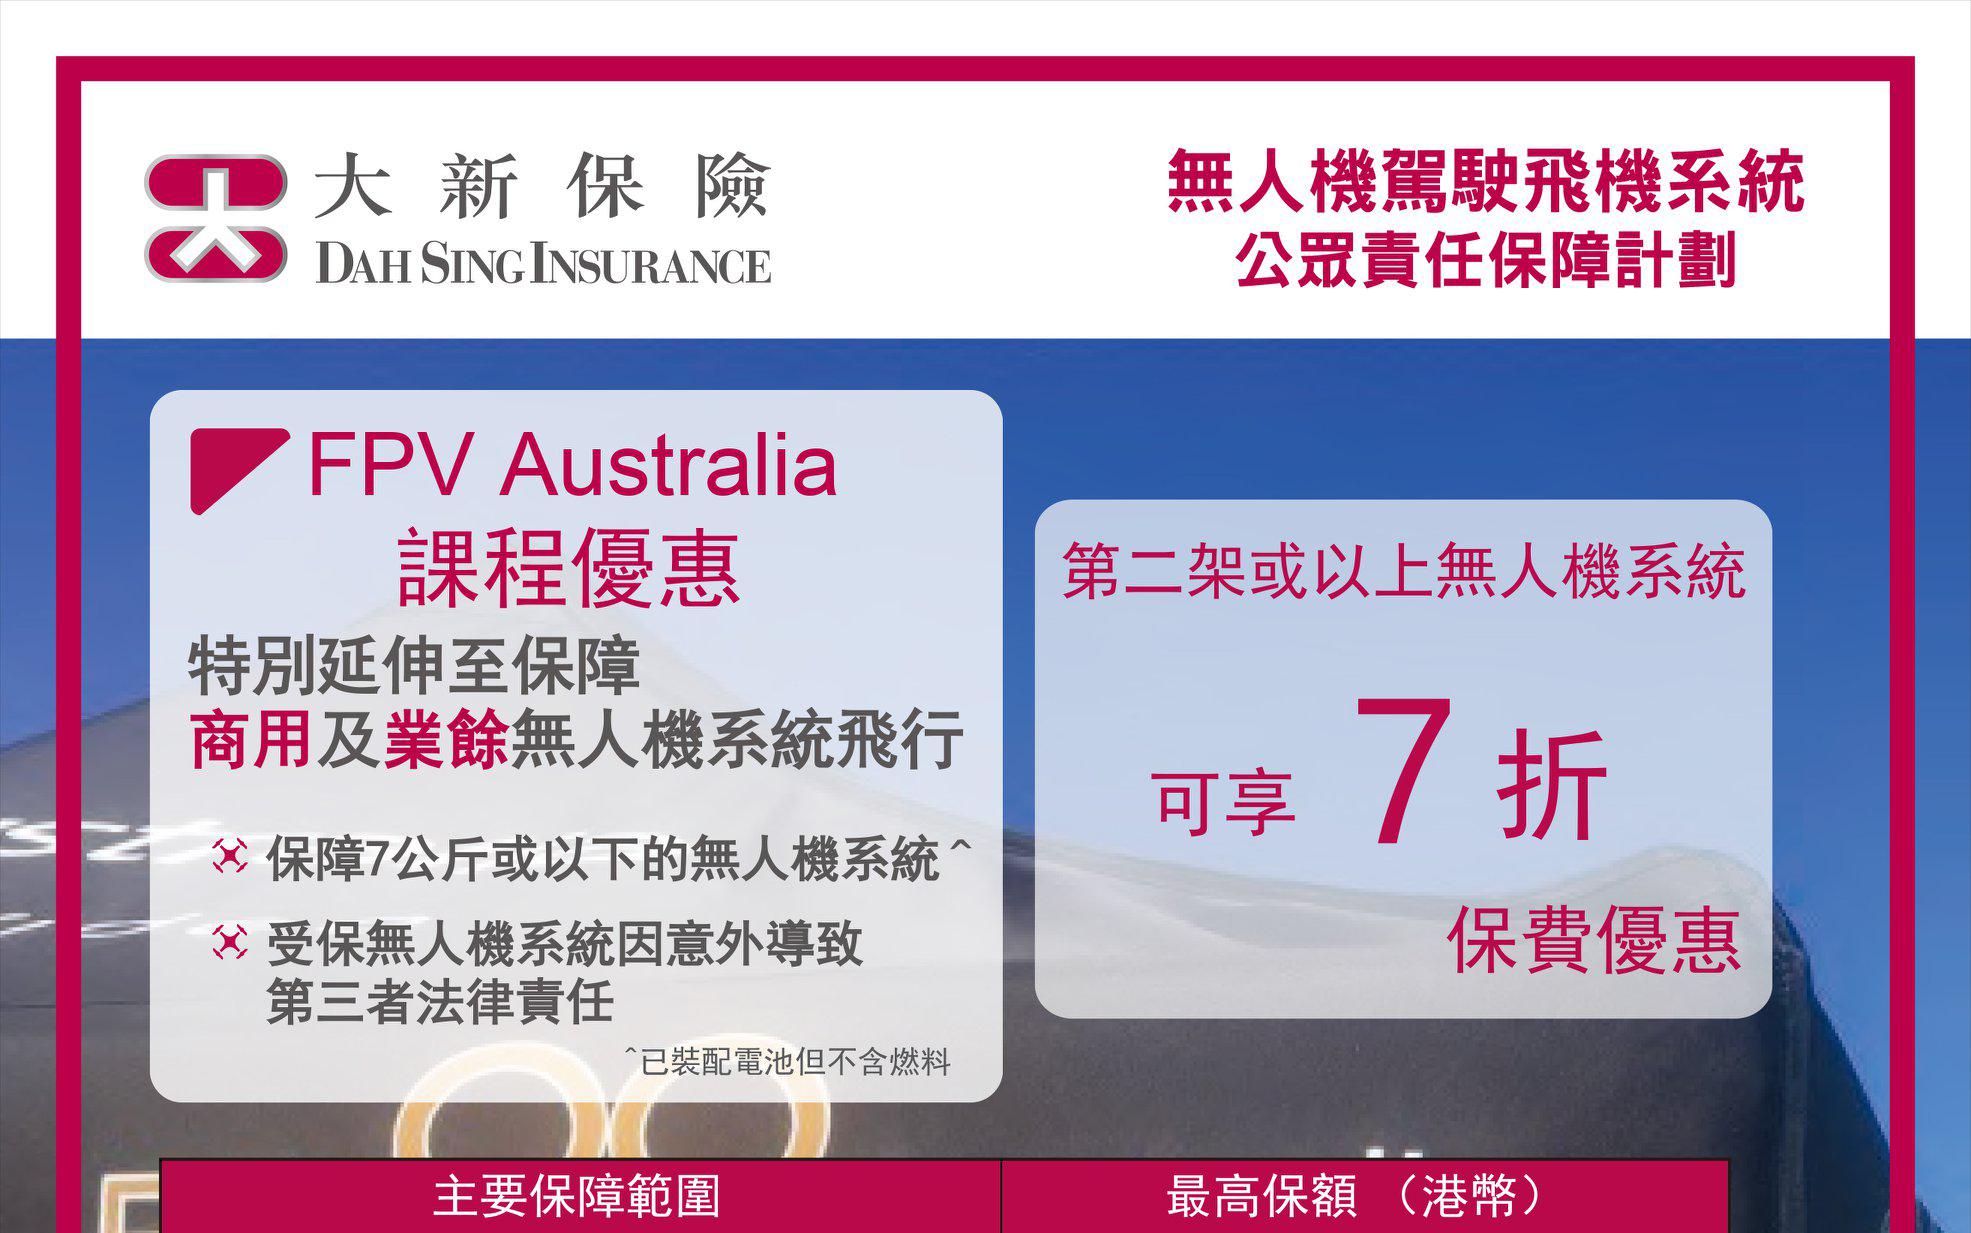 【OTG 無人機證書課程第三保險 --- DJI Academy 和 FPV Australia】